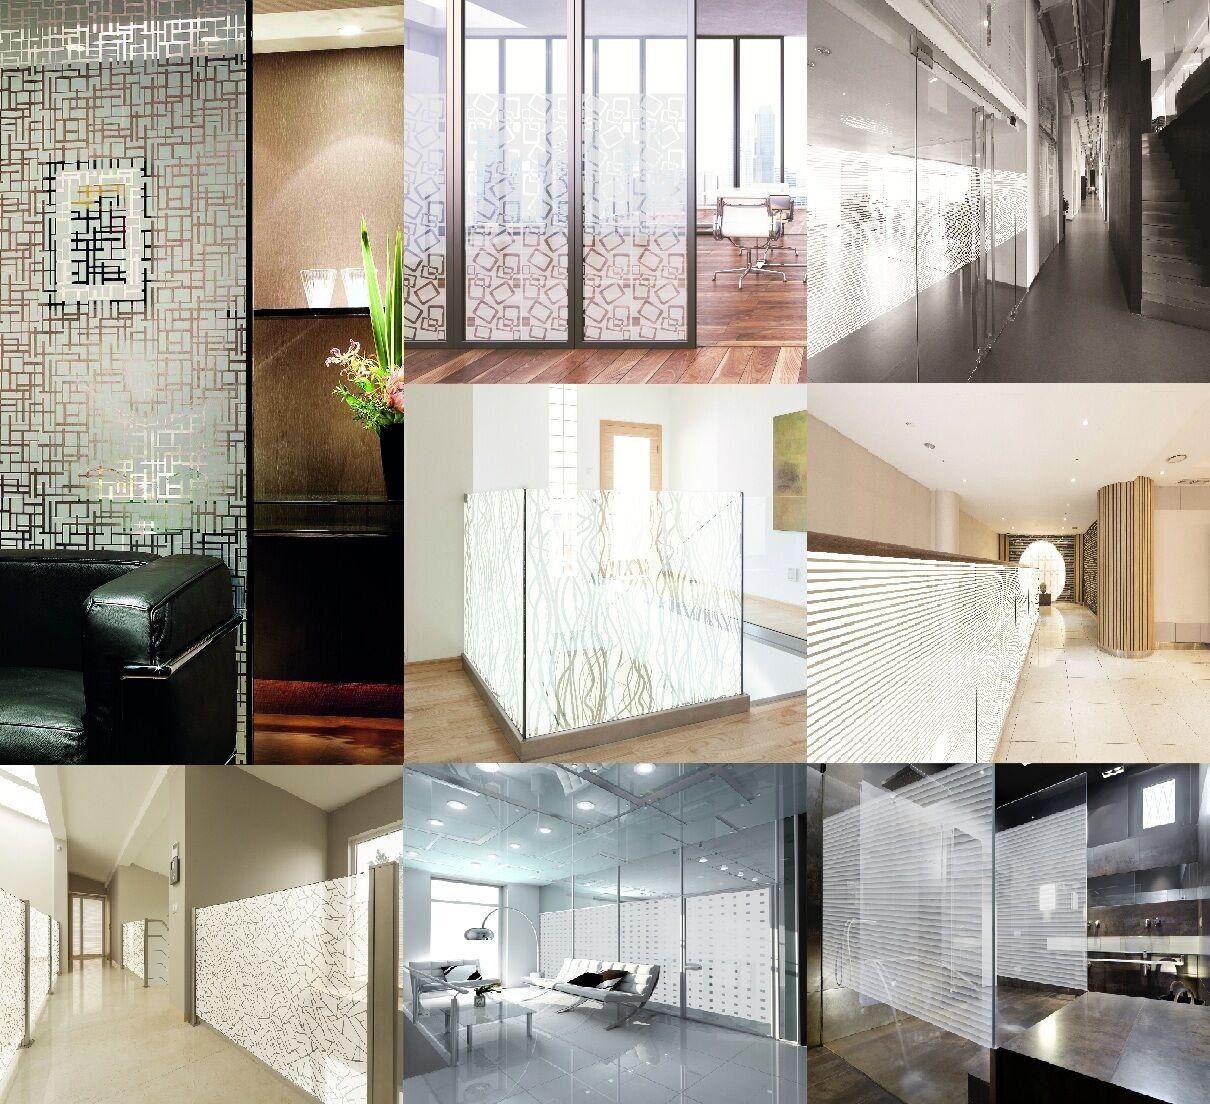 6,67   m² premium de projoección visual lámina cristal esmerilado lámina diseño Diapositivas autoadhesivo